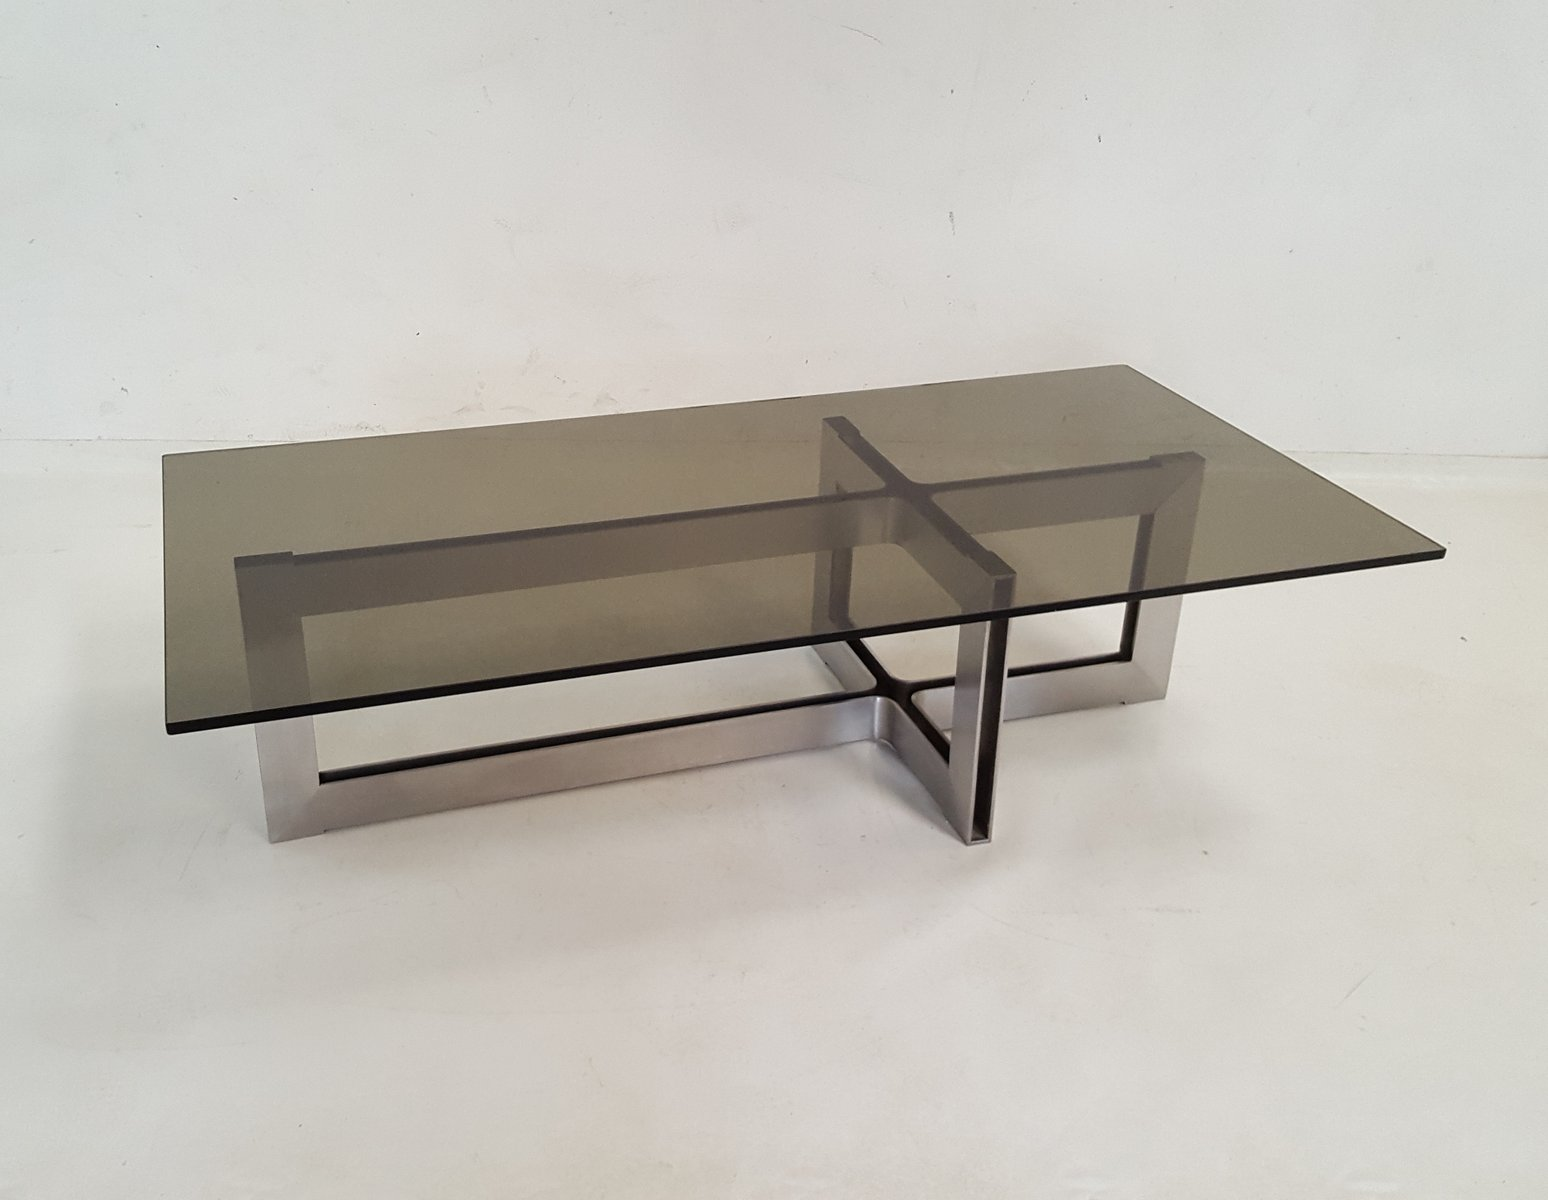 table basse en acier inoxydable et verre 1970s en vente sur pamono. Black Bedroom Furniture Sets. Home Design Ideas